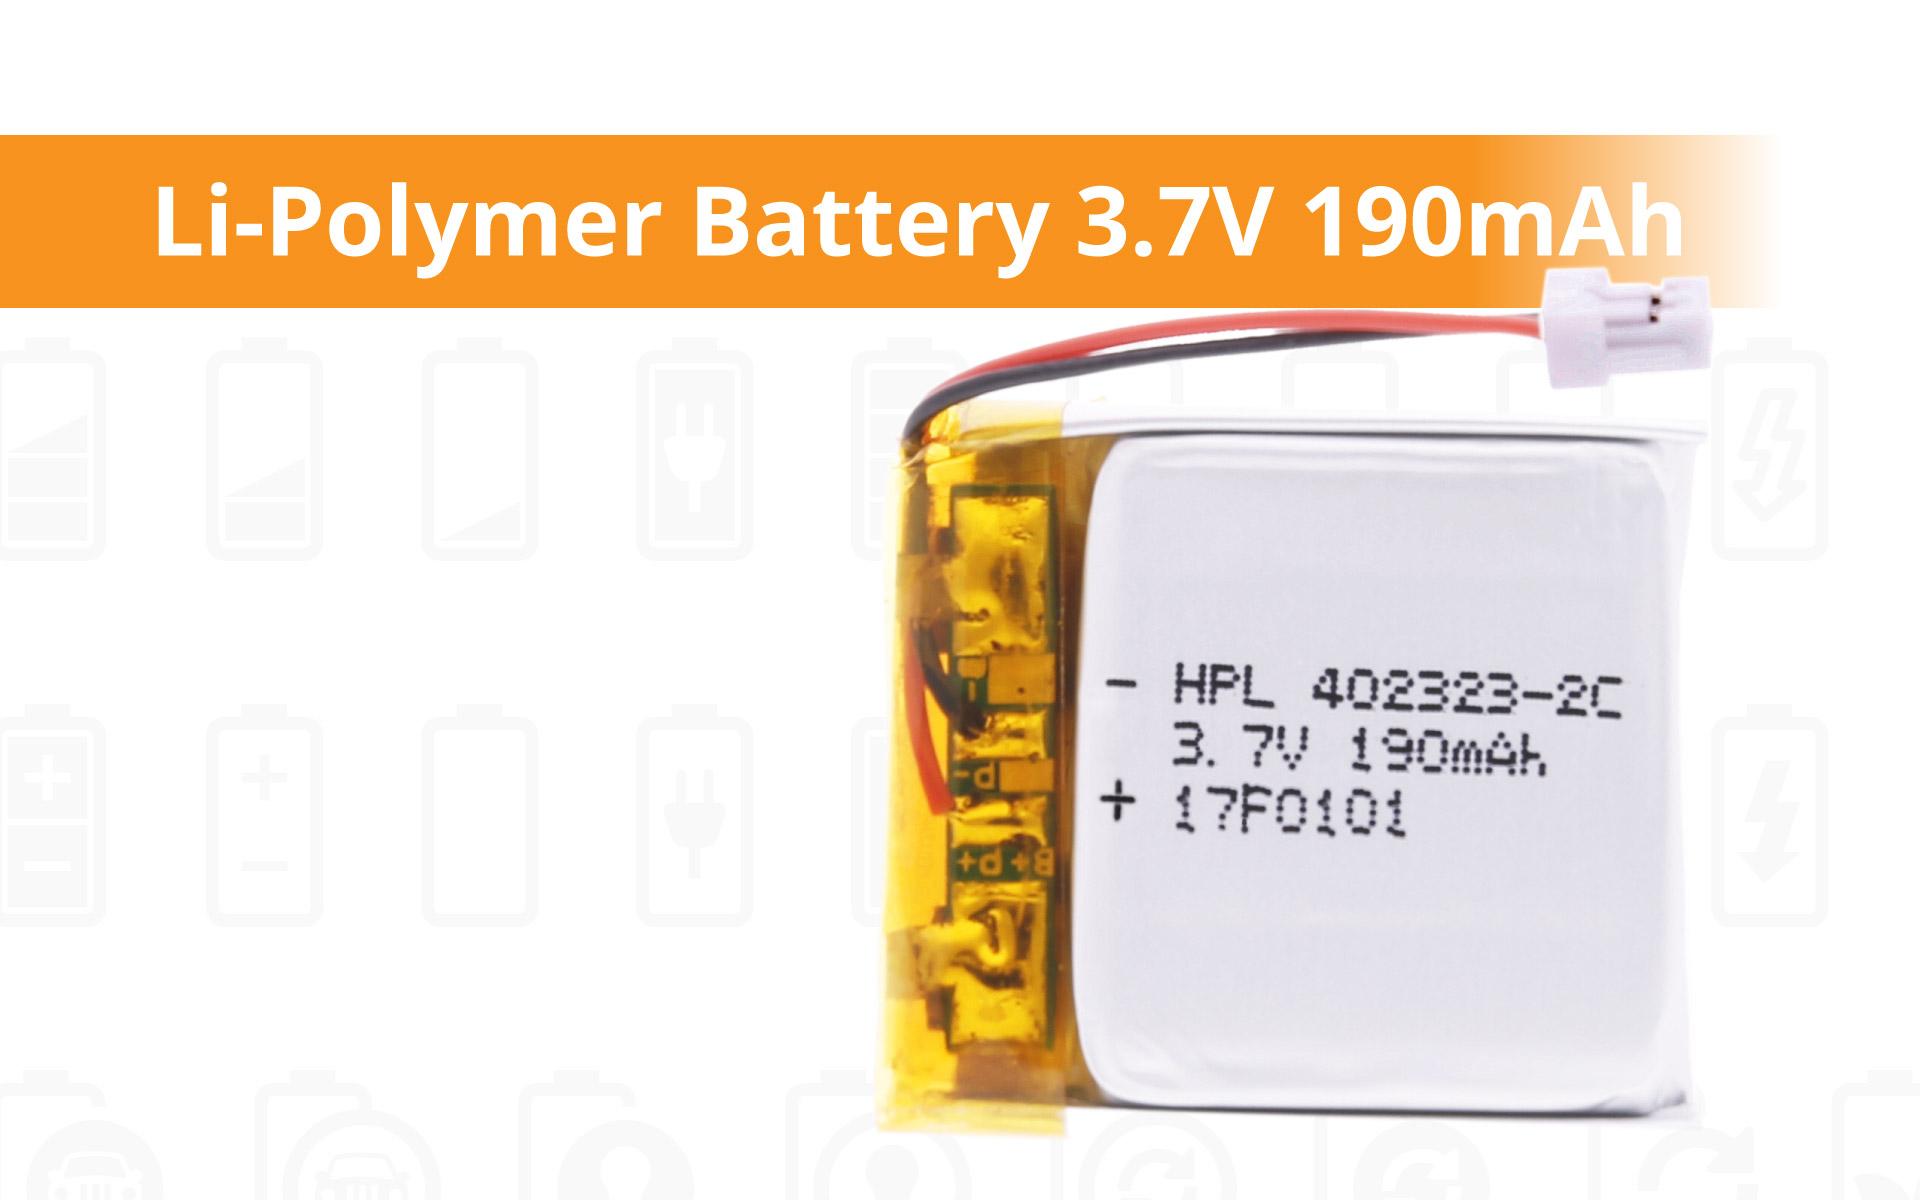 Li-Polymer Battery 3.7V 190mAh - power your device